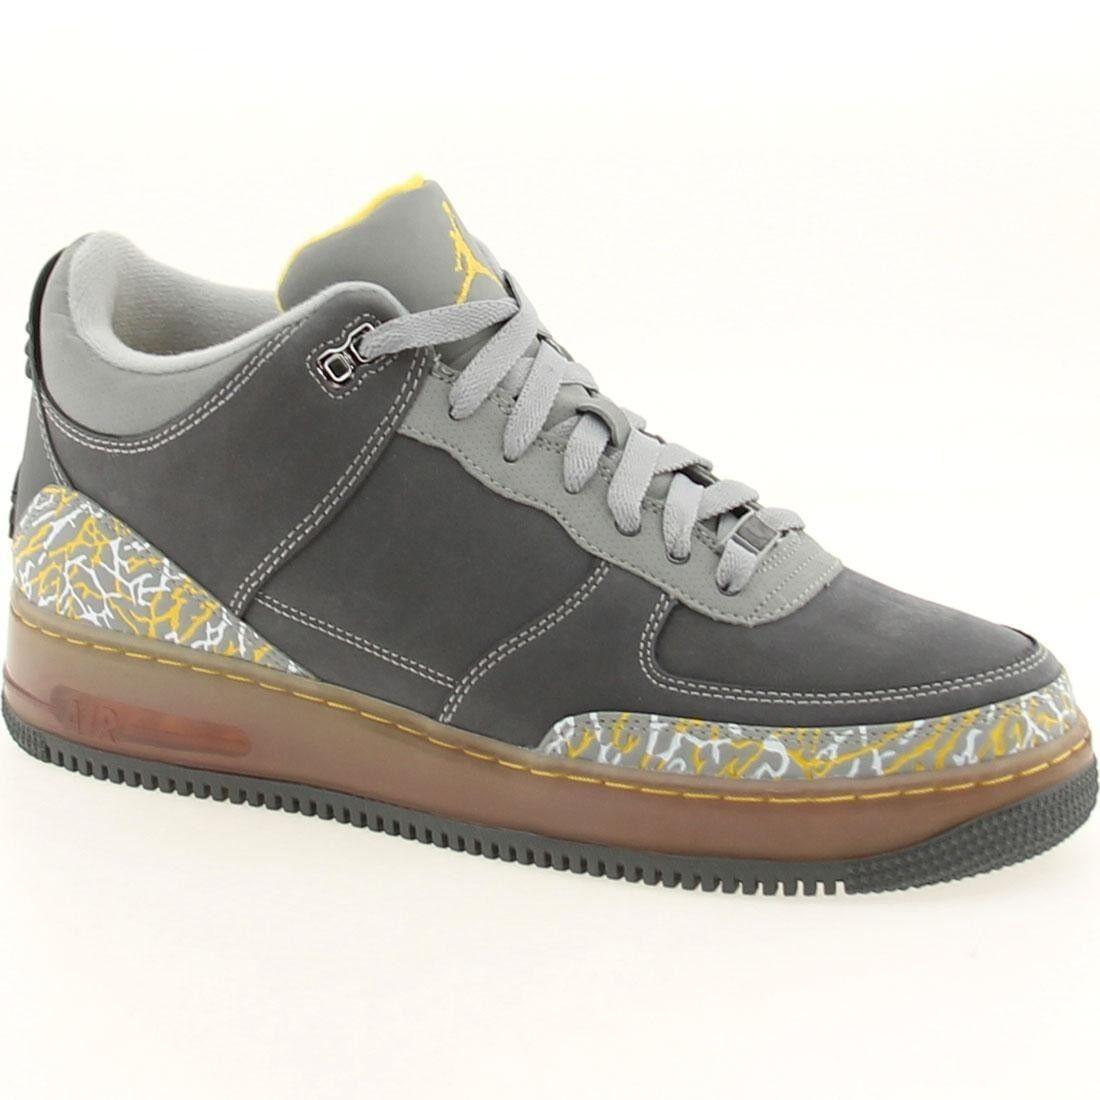 323626-071  150 nike Air Jordan 3 III AJF Force 1 Fusion flint grey shoes